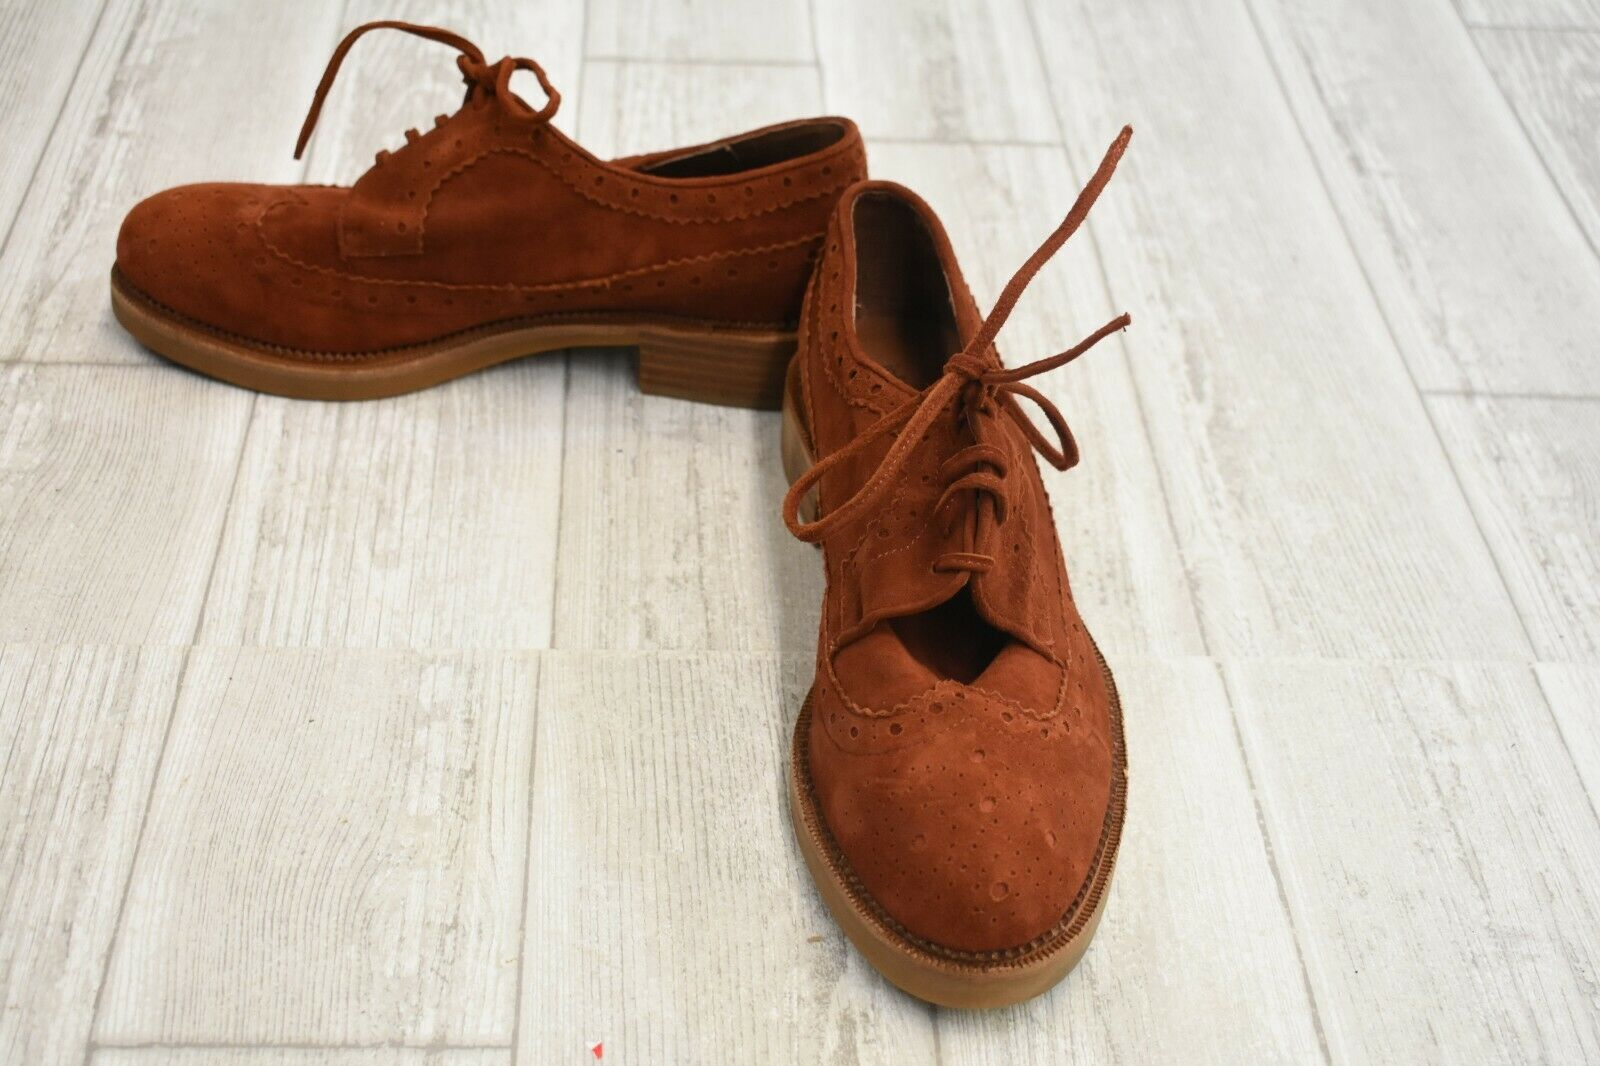 Jeffrey Campbell Gershwin Oxford scarpe - Wouomo Dimensione 8 -  Rust Suede  best-seller